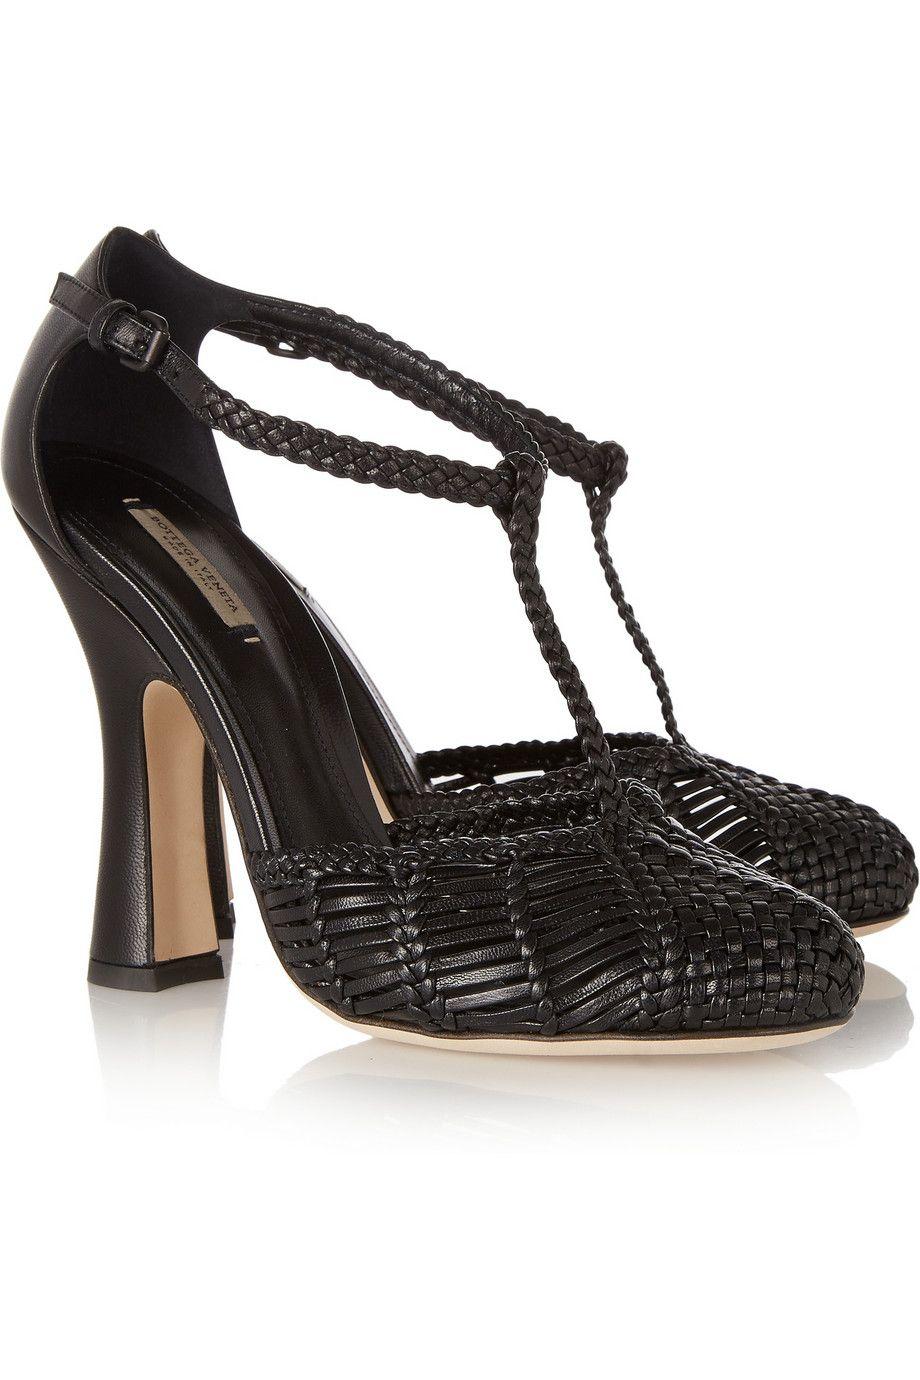 Bottega Veneta Woven leather Mary Jane pumps NET-A-PORTER.COM